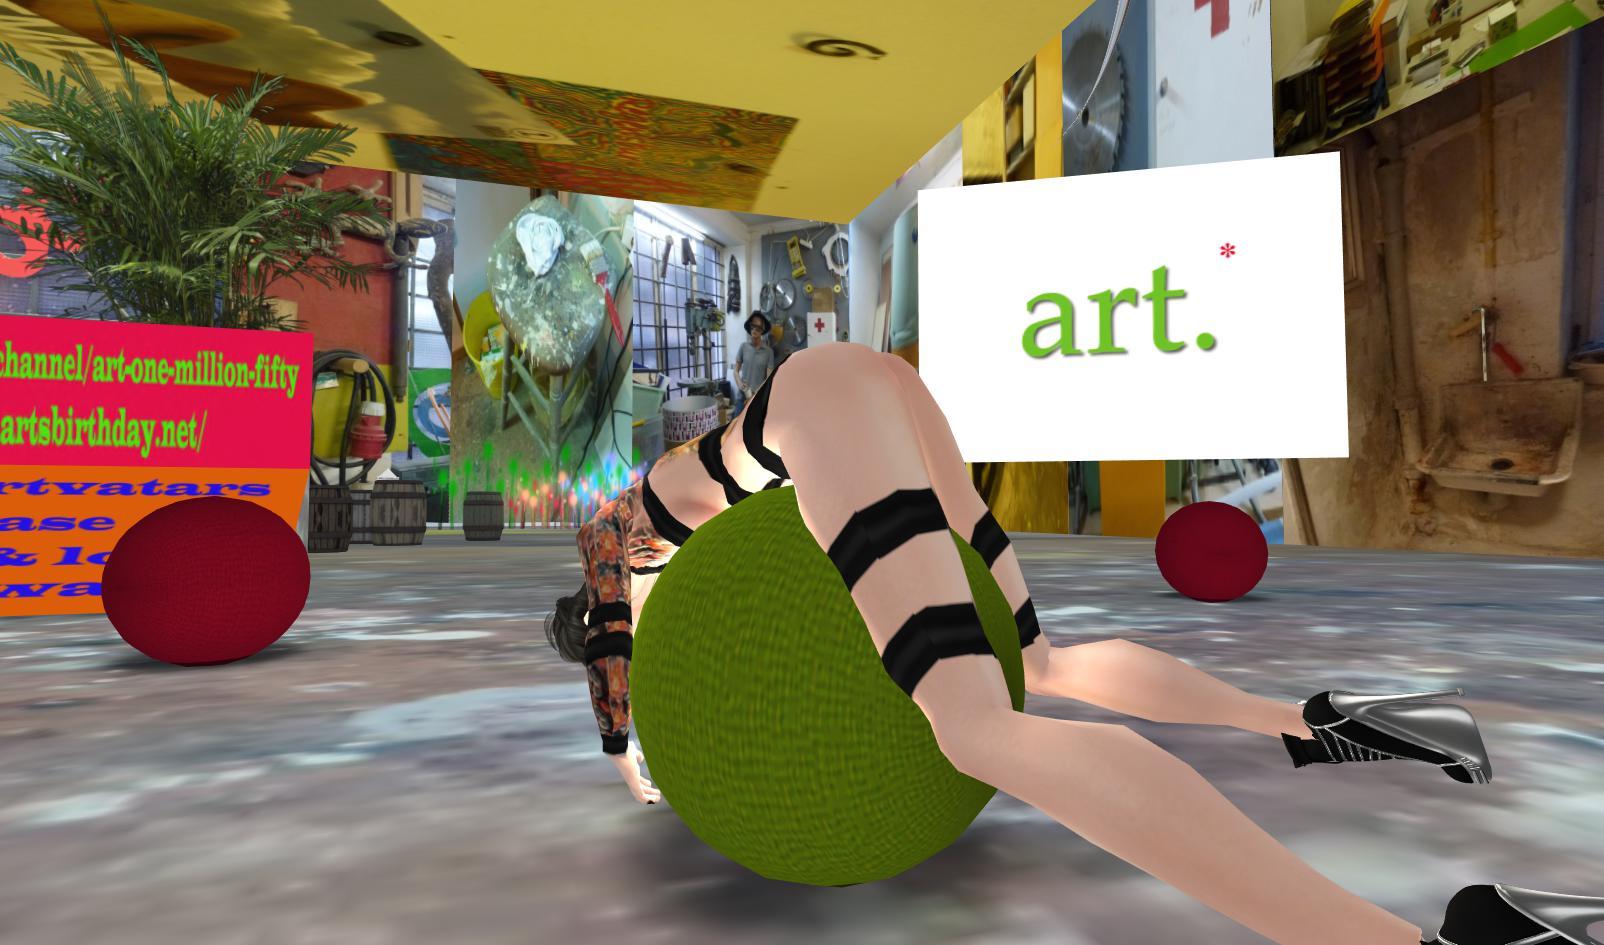 artsbdayweb_002